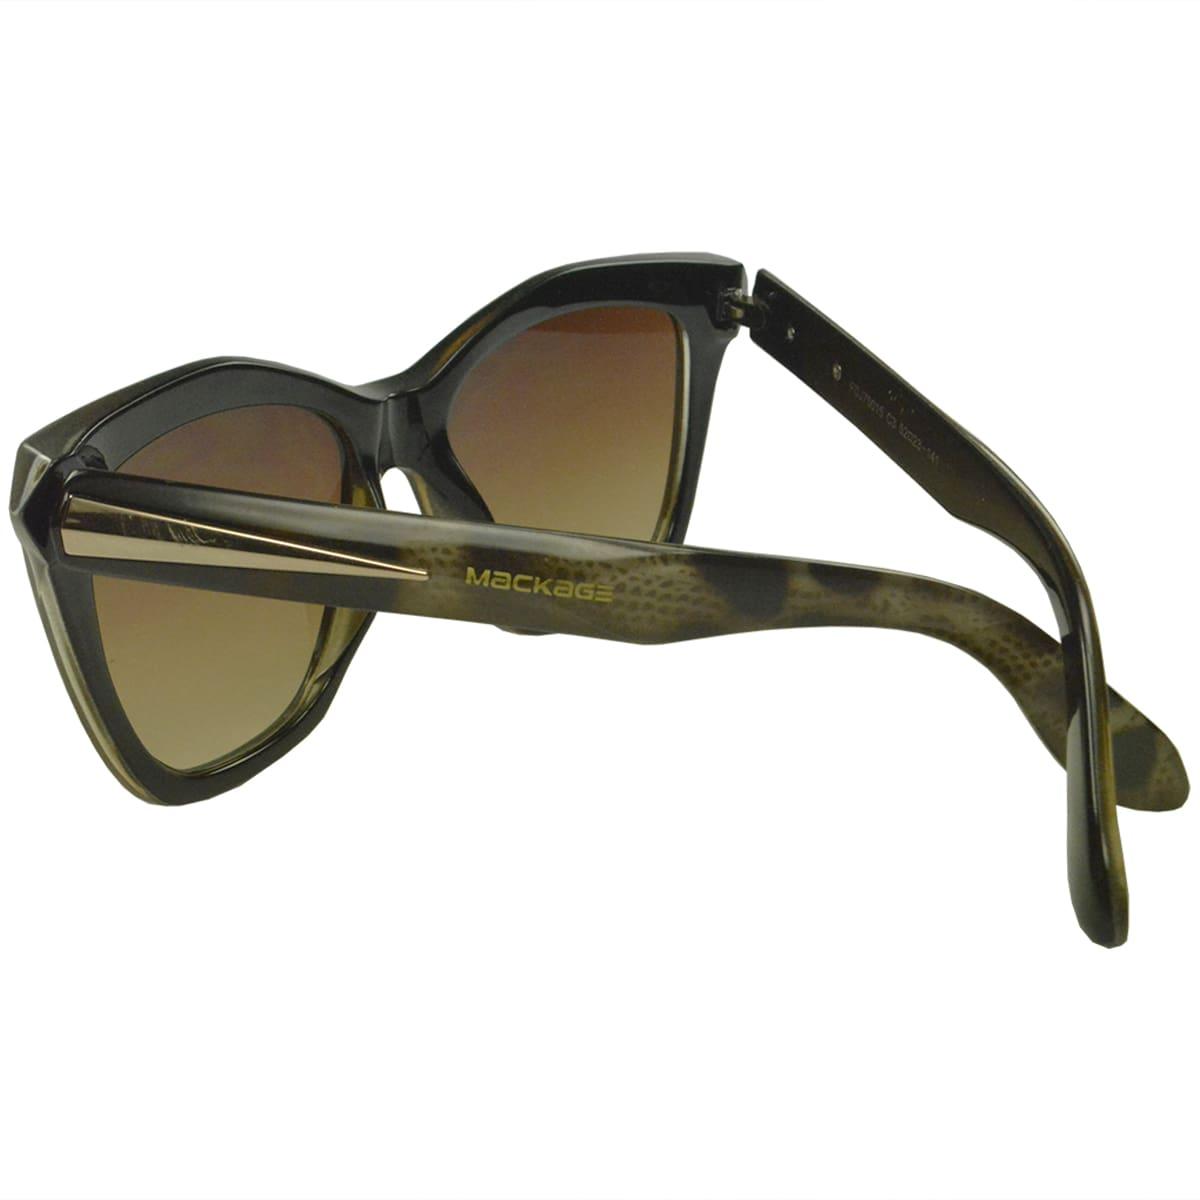 Óculos de Sol Mackage MK75015C3LN Pele de Cobra